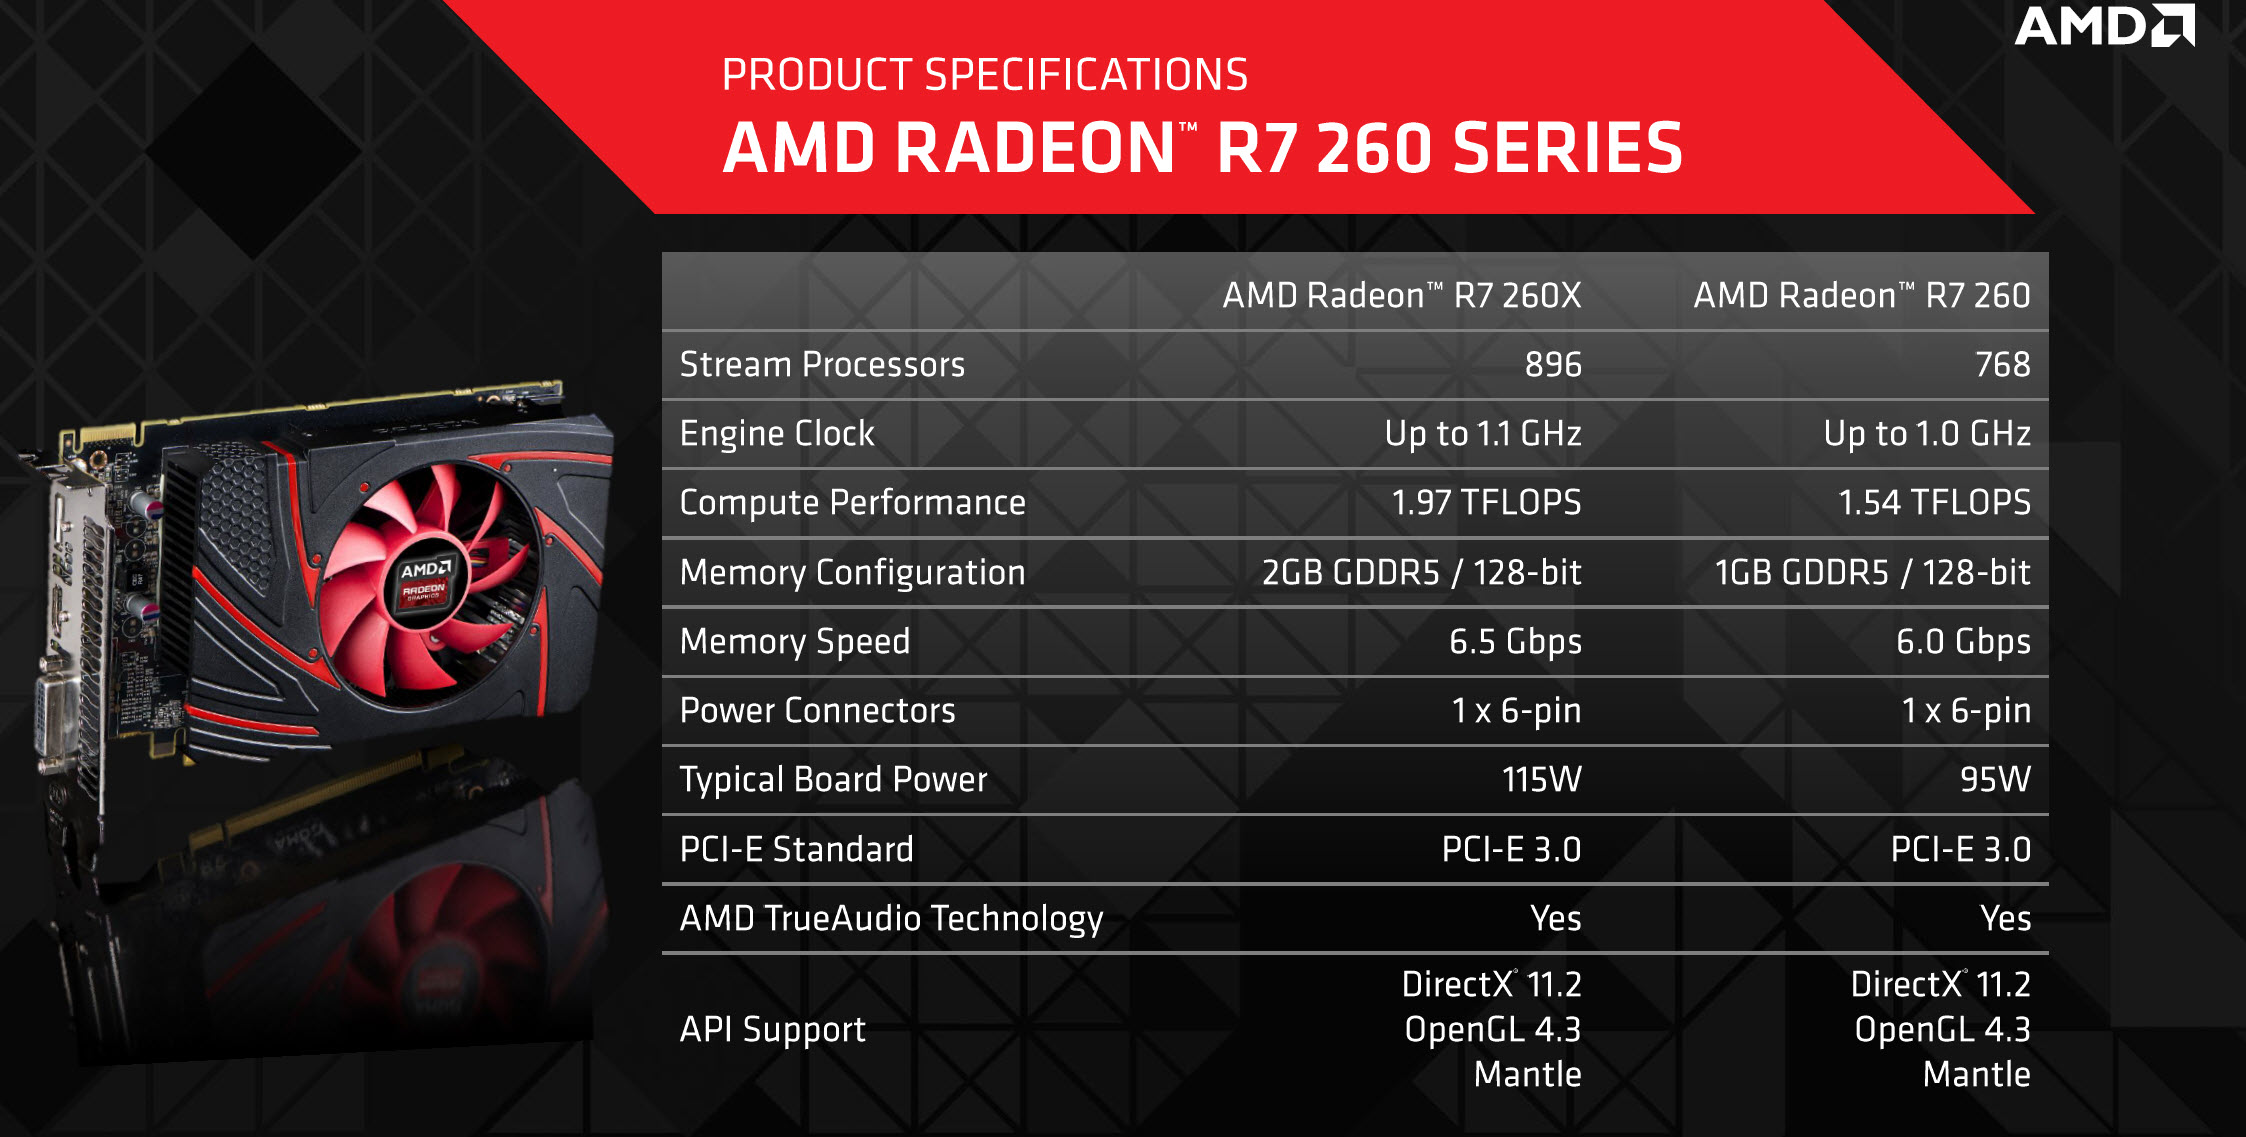 AMD Unveils The Radeon R7 260 'Bonaire Pro' GPU - Launches ...